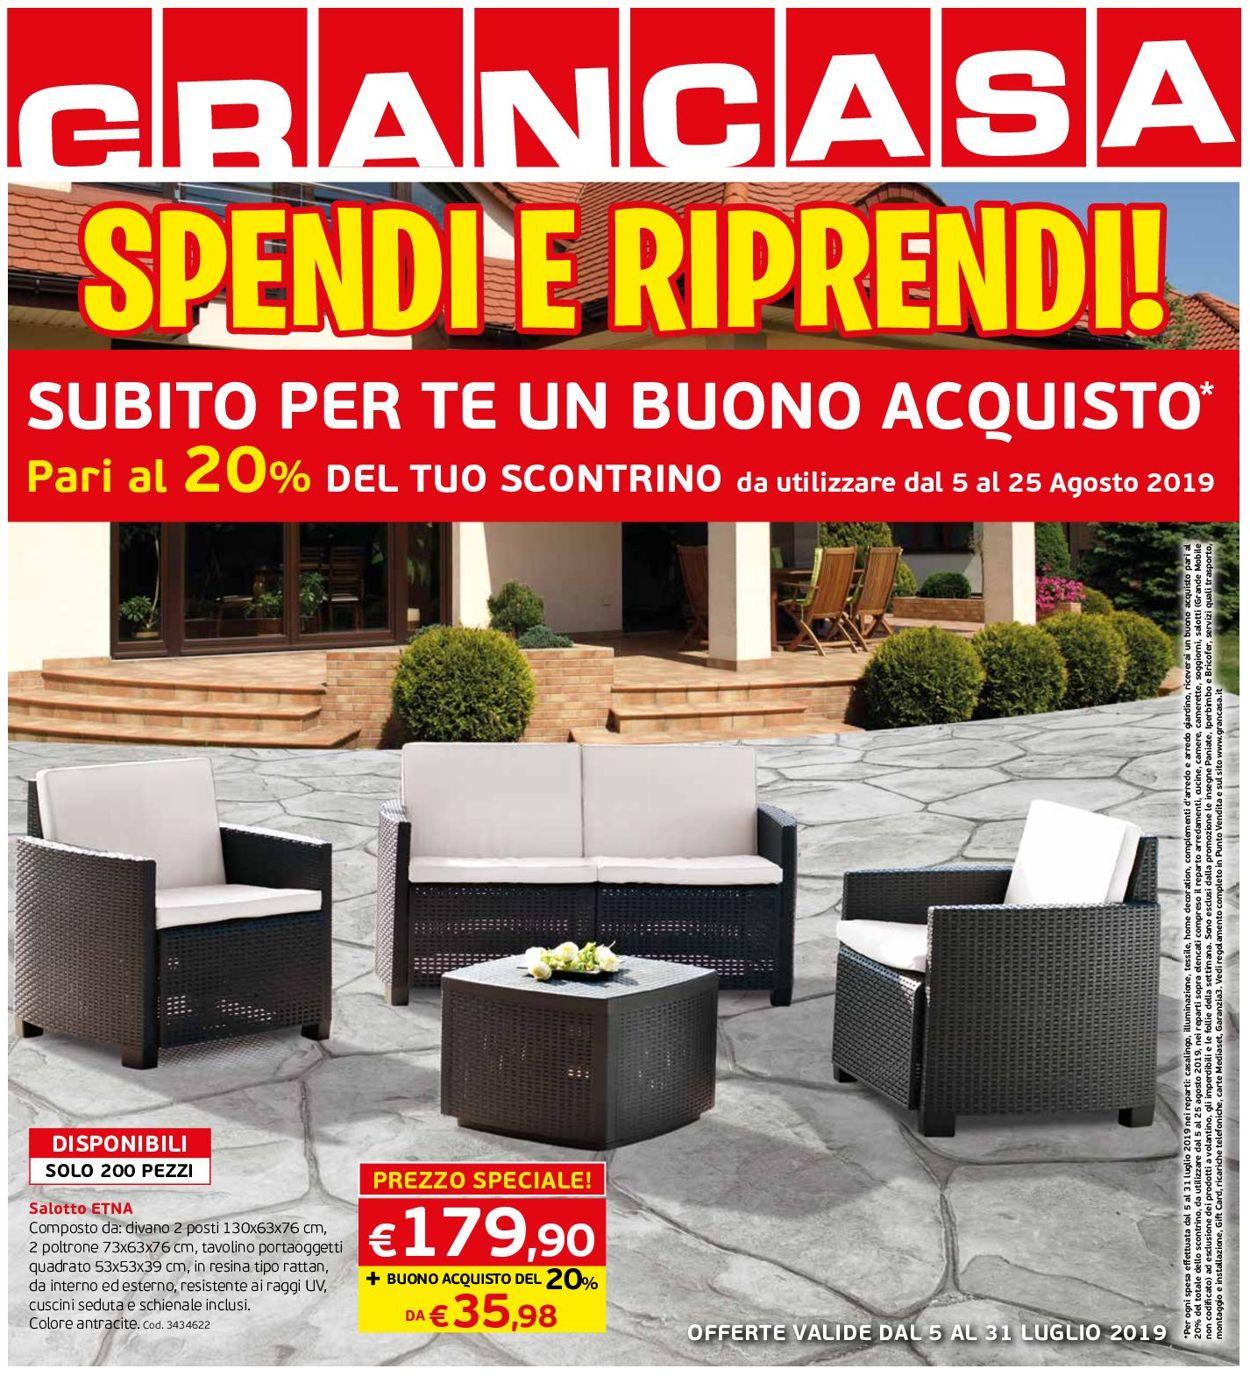 Volantino Grancasa - Offerte 05/07-31/07/2019